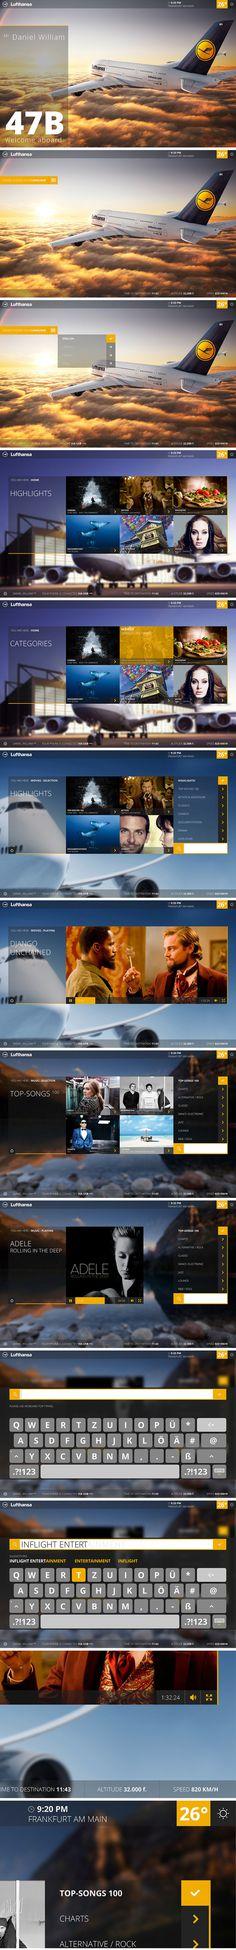 Lufthansa Inflight Entertainment System. #ui #ux #webdesign #lufthansa #app #graphic